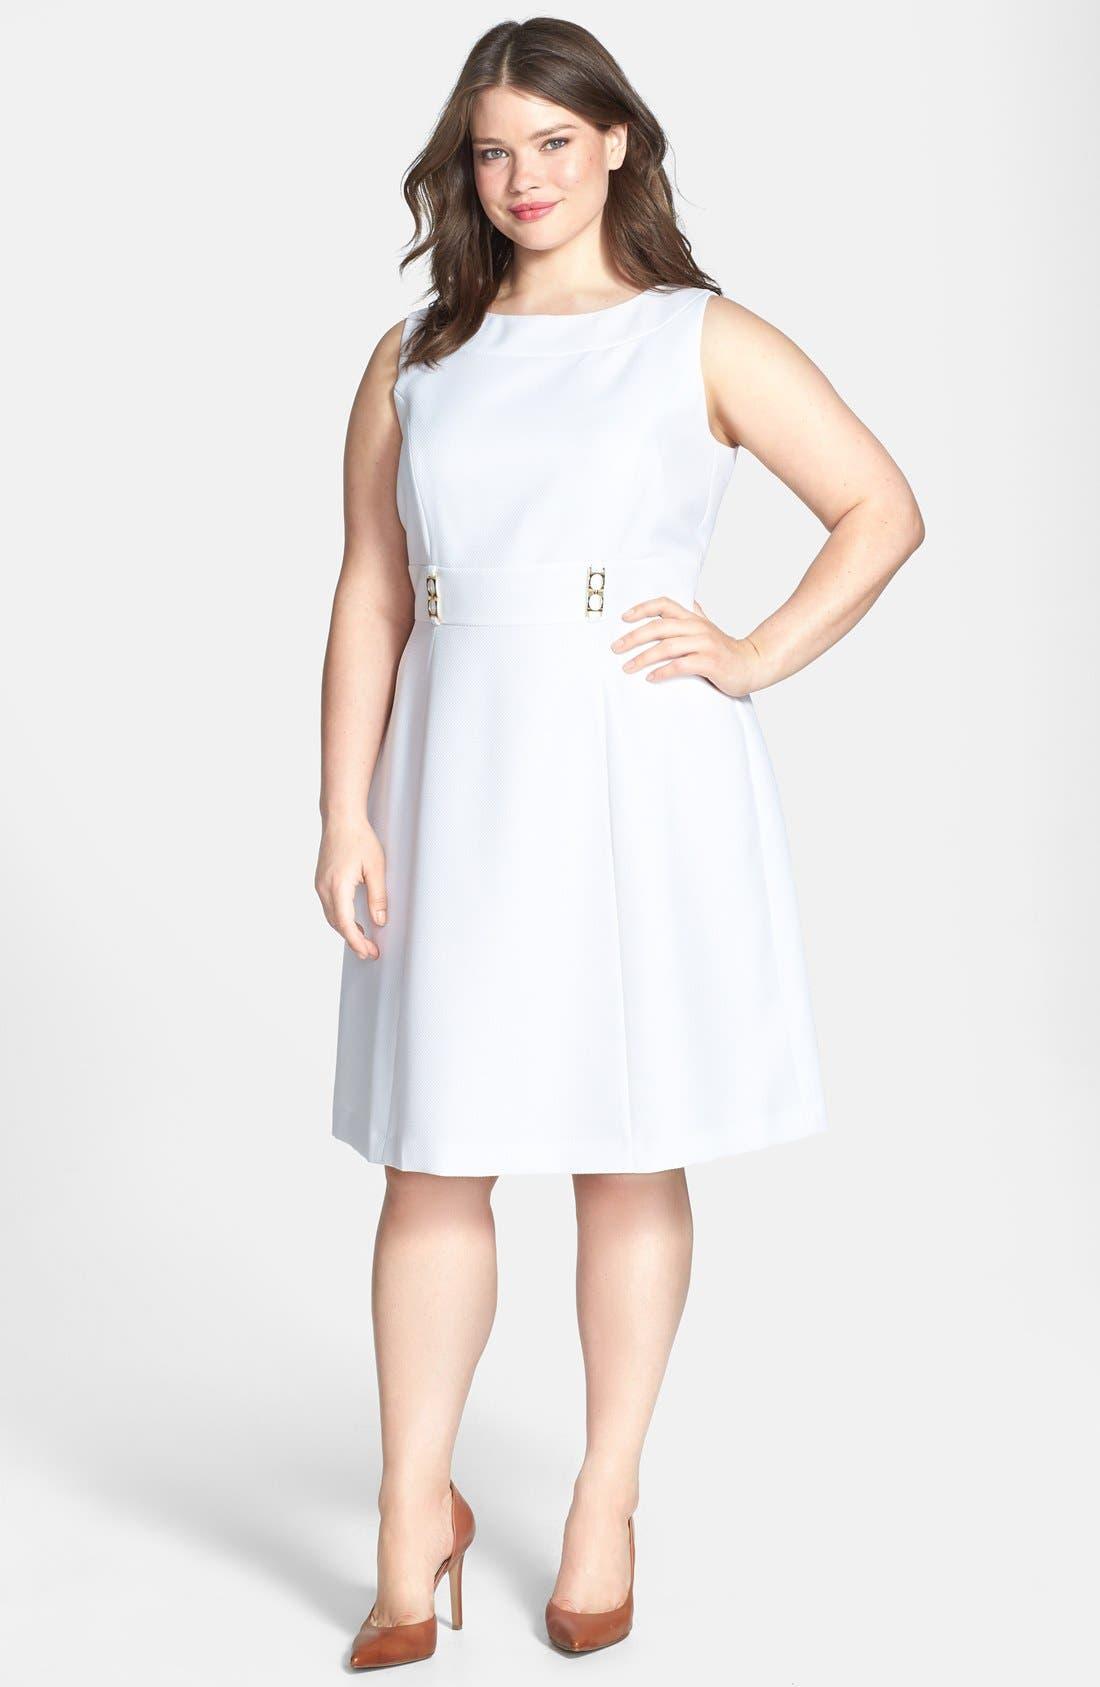 Alternate Image 1 Selected - Tahari Textured Fit & Flare Dress (Plus Size)